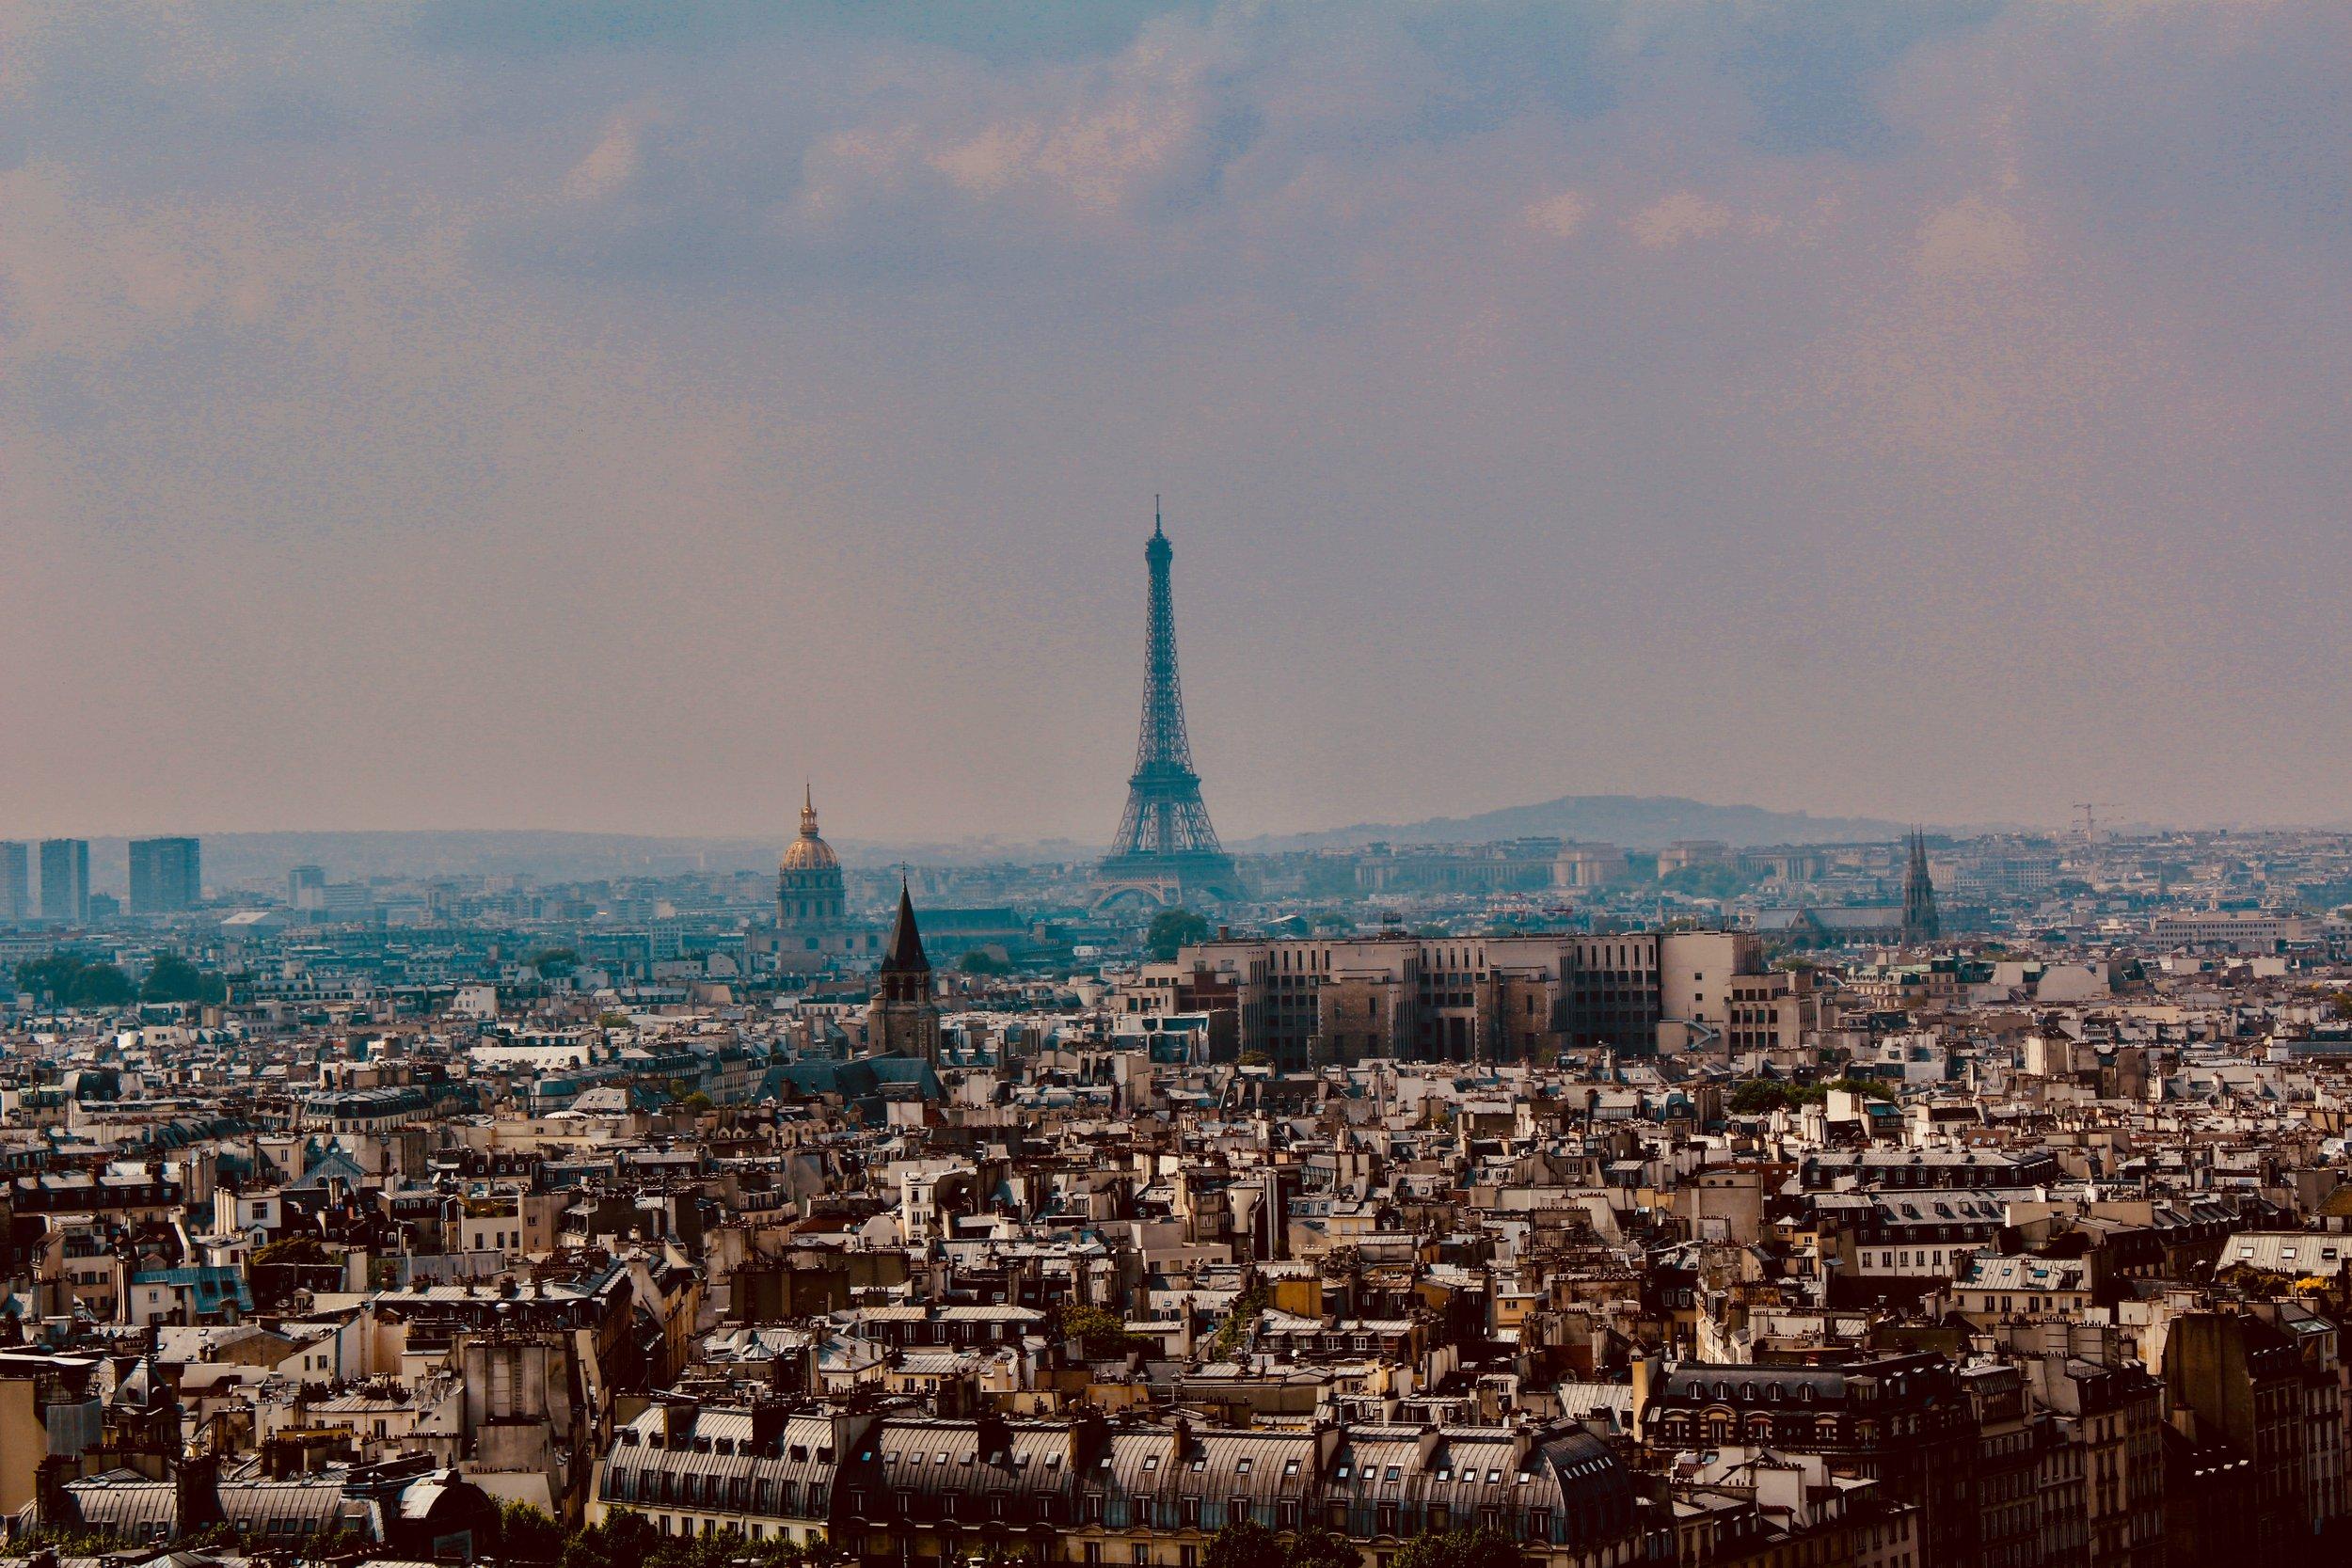 FORBIDDEN PARIS : MEGASTRUCTURES OF THE SHADOWS